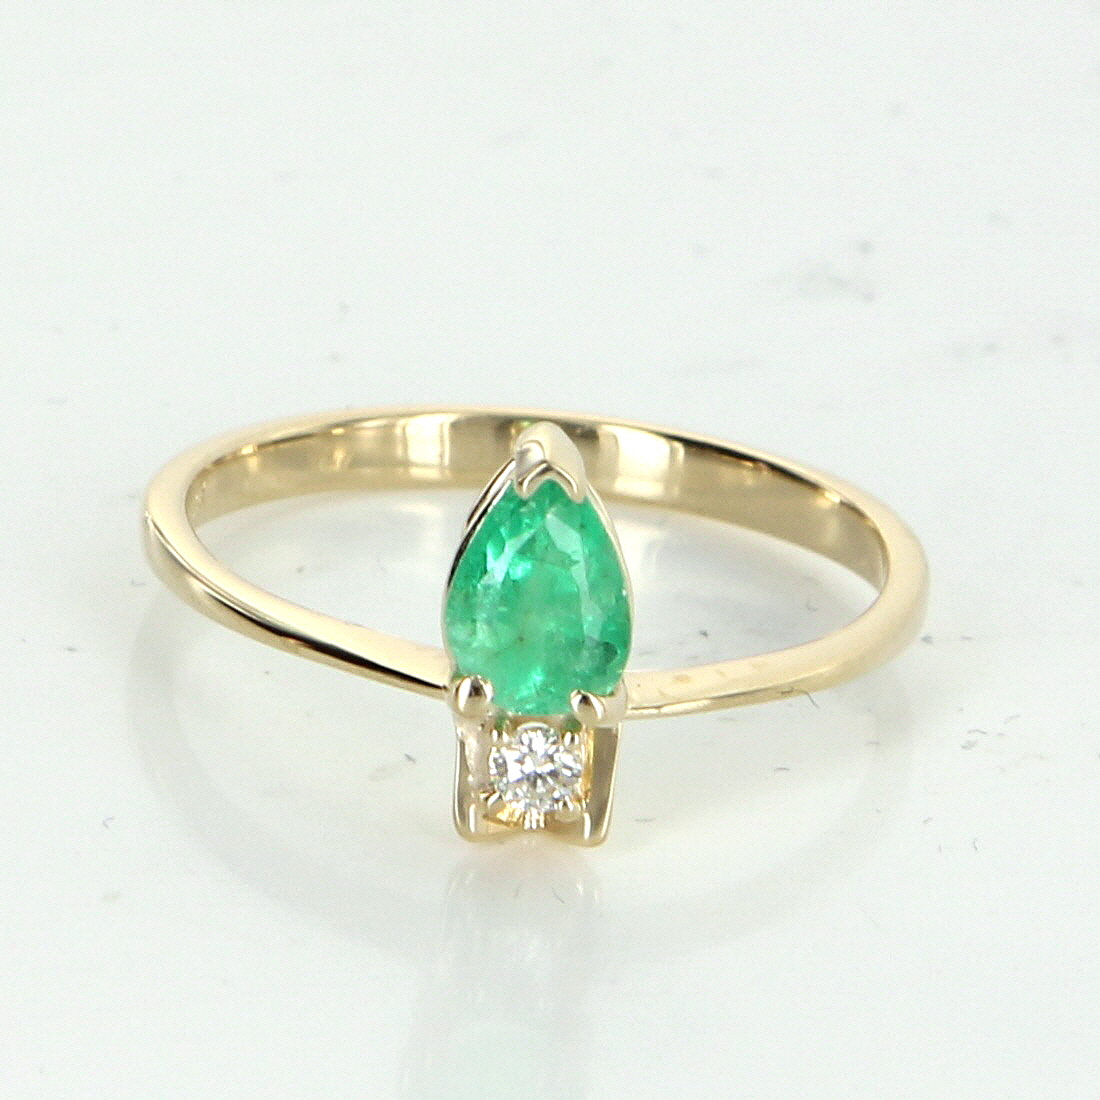 emerald stacking ring vintage 18k yellow gold